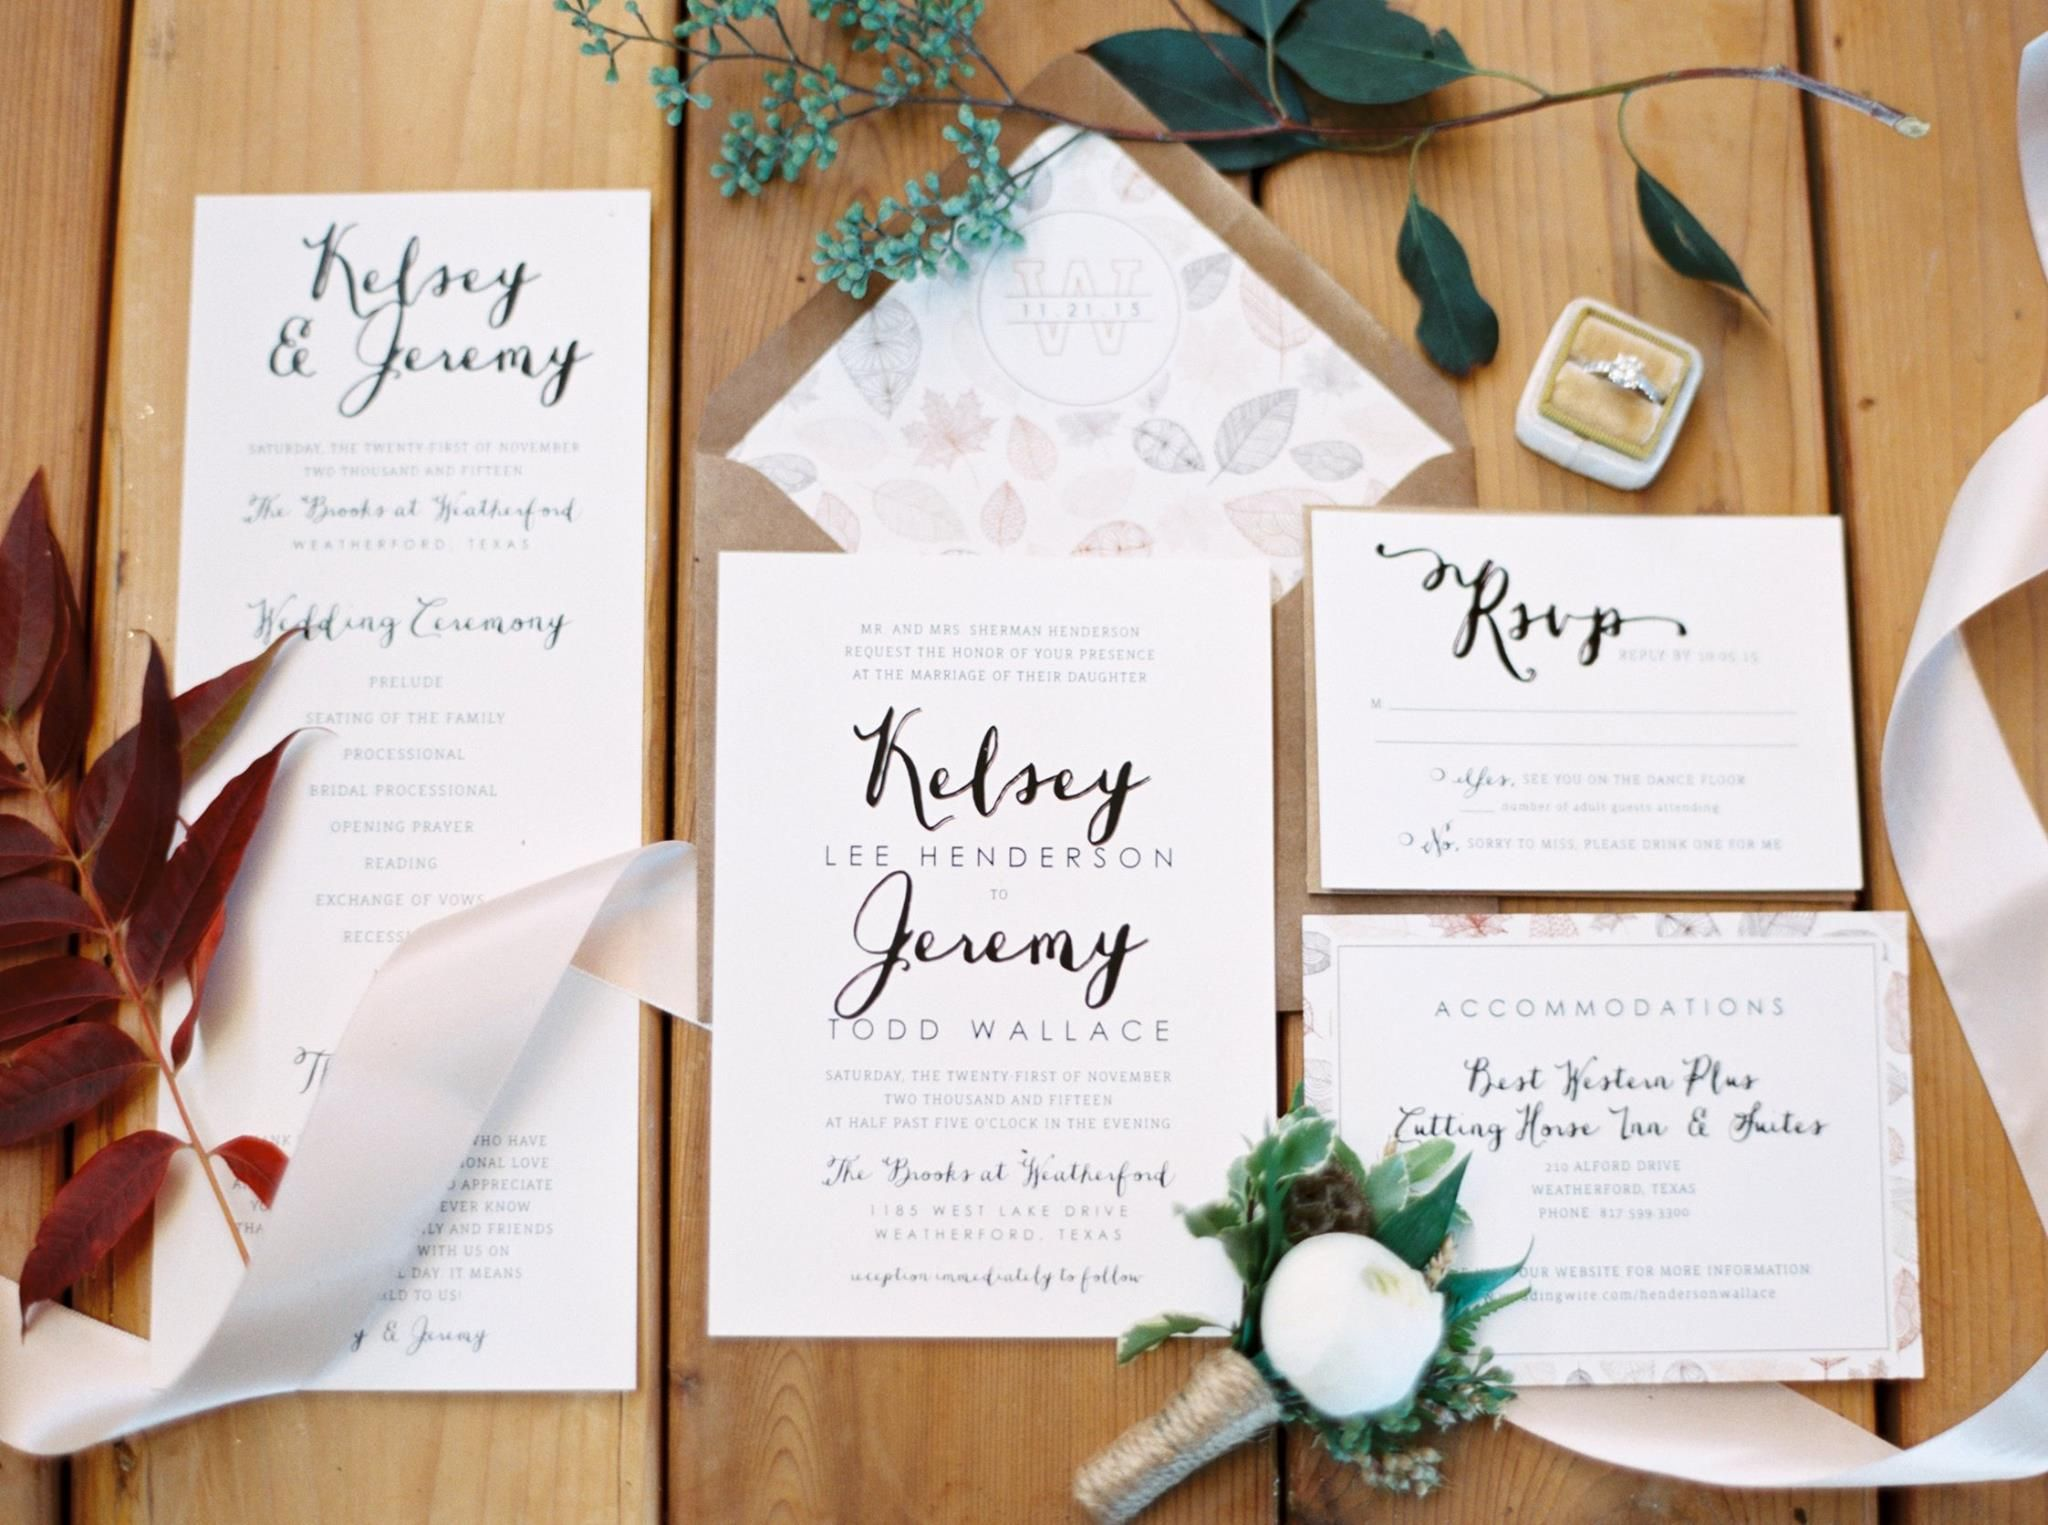 Natural Wedding Simple Wedding Invitations Fall Wedding Nature Wedding Invitations Wedding Invitations Wedding Invitation Video